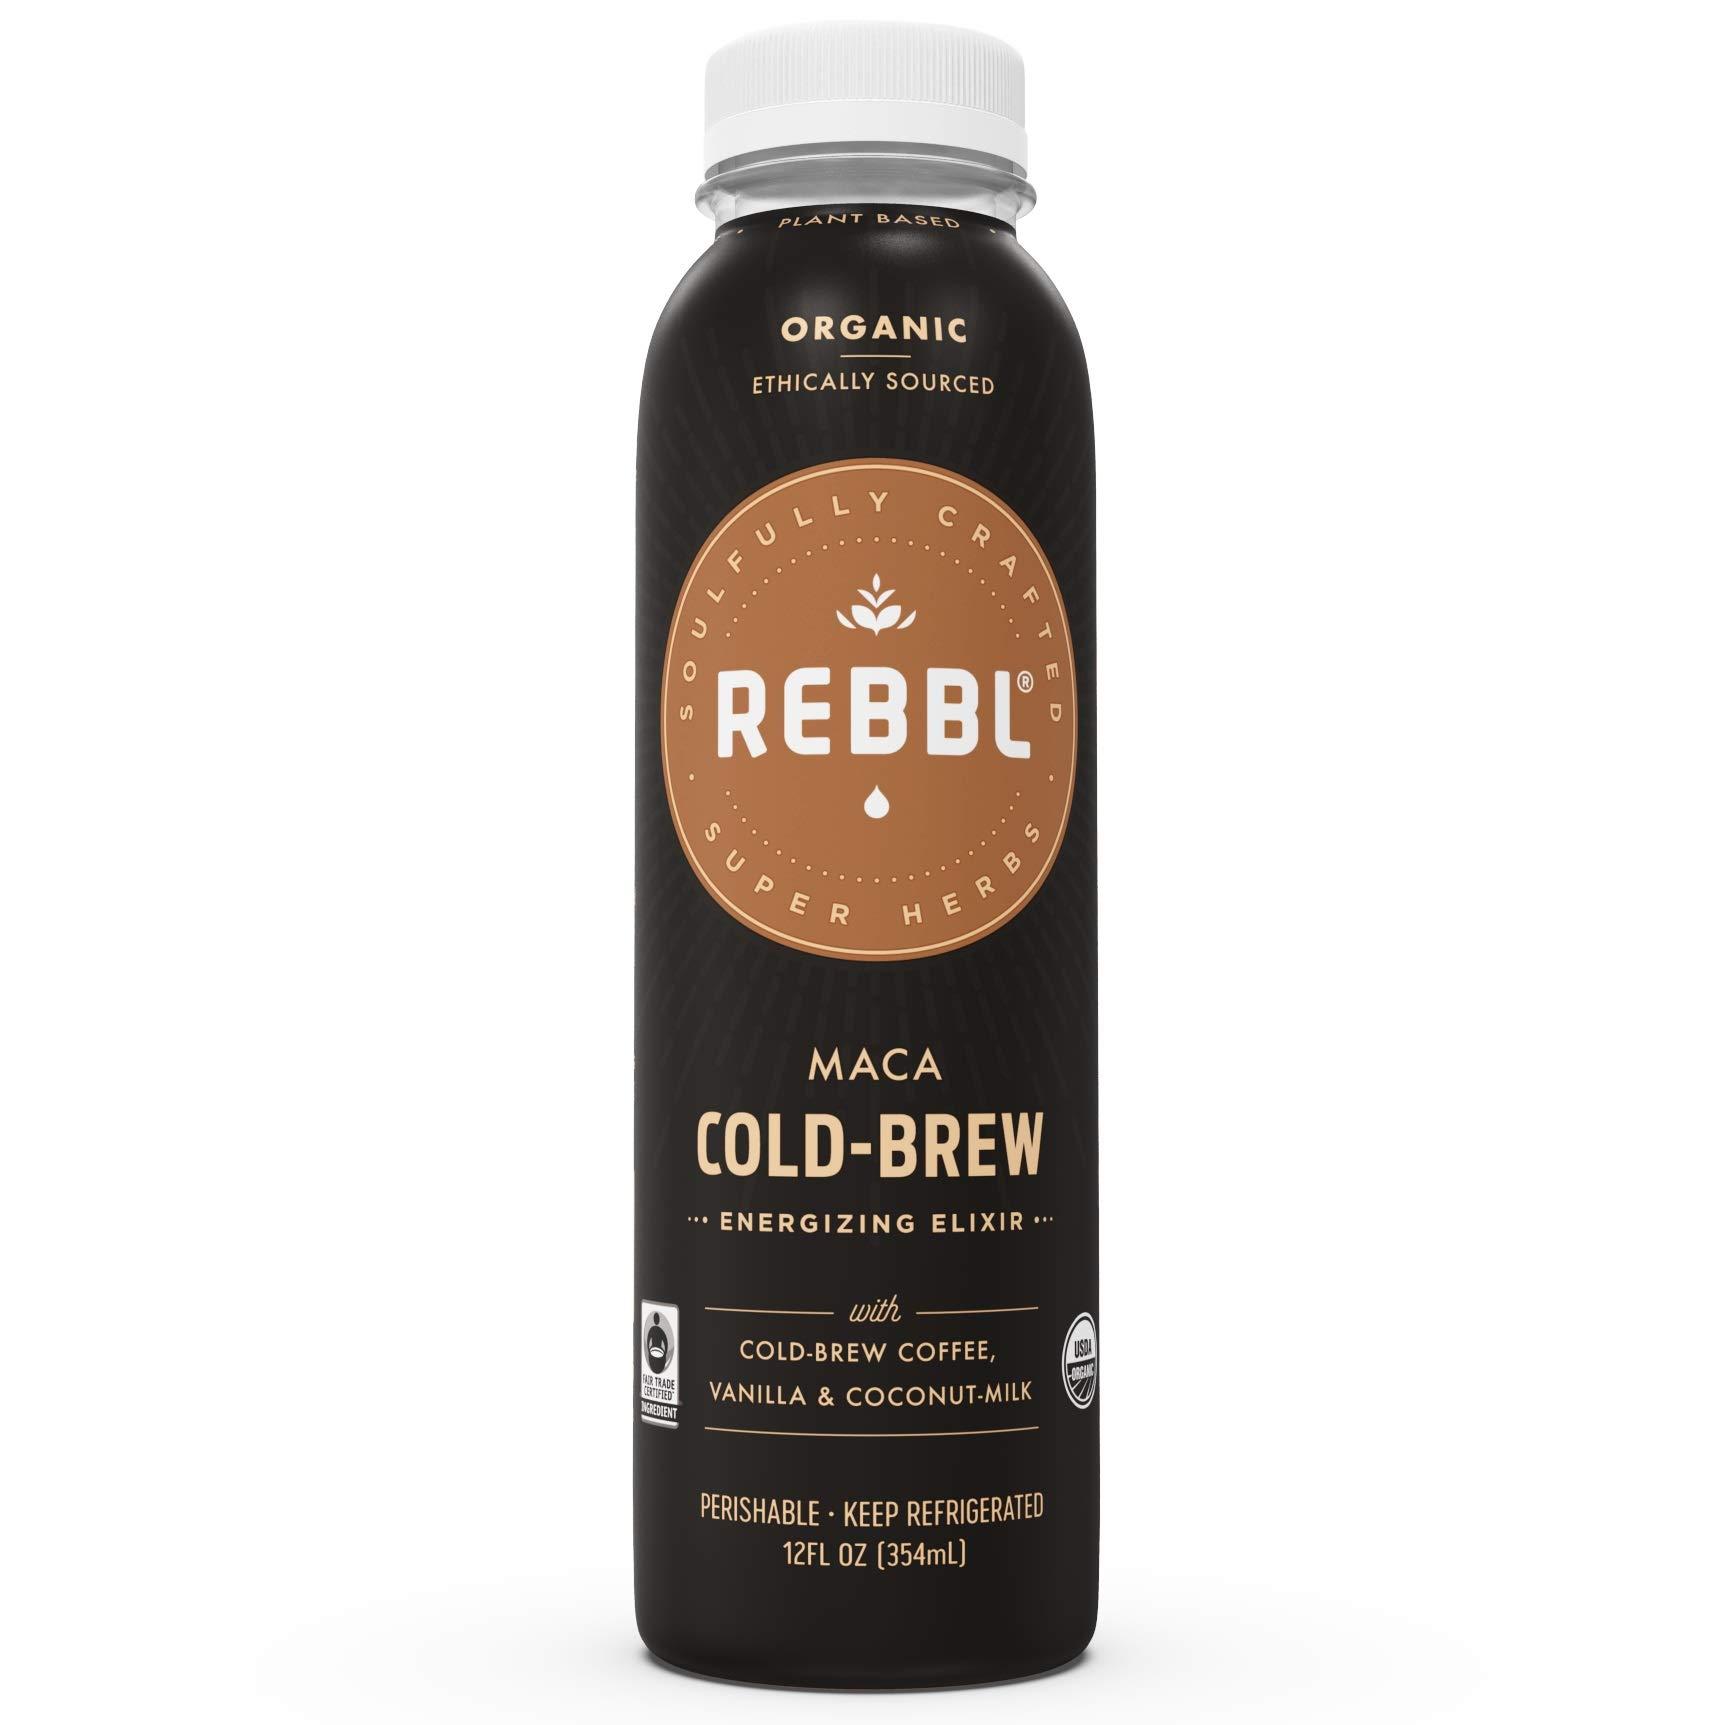 REBBL Super Herb Powered Elixirs | Maca Cold Brew Coffee Elixir 12 Pack | 12 Fl Oz | Gluten Free, Organic, Non GMO, Vegan | 750mg 4: 1 Maca Extract, 140mg Caffeine by REBBL